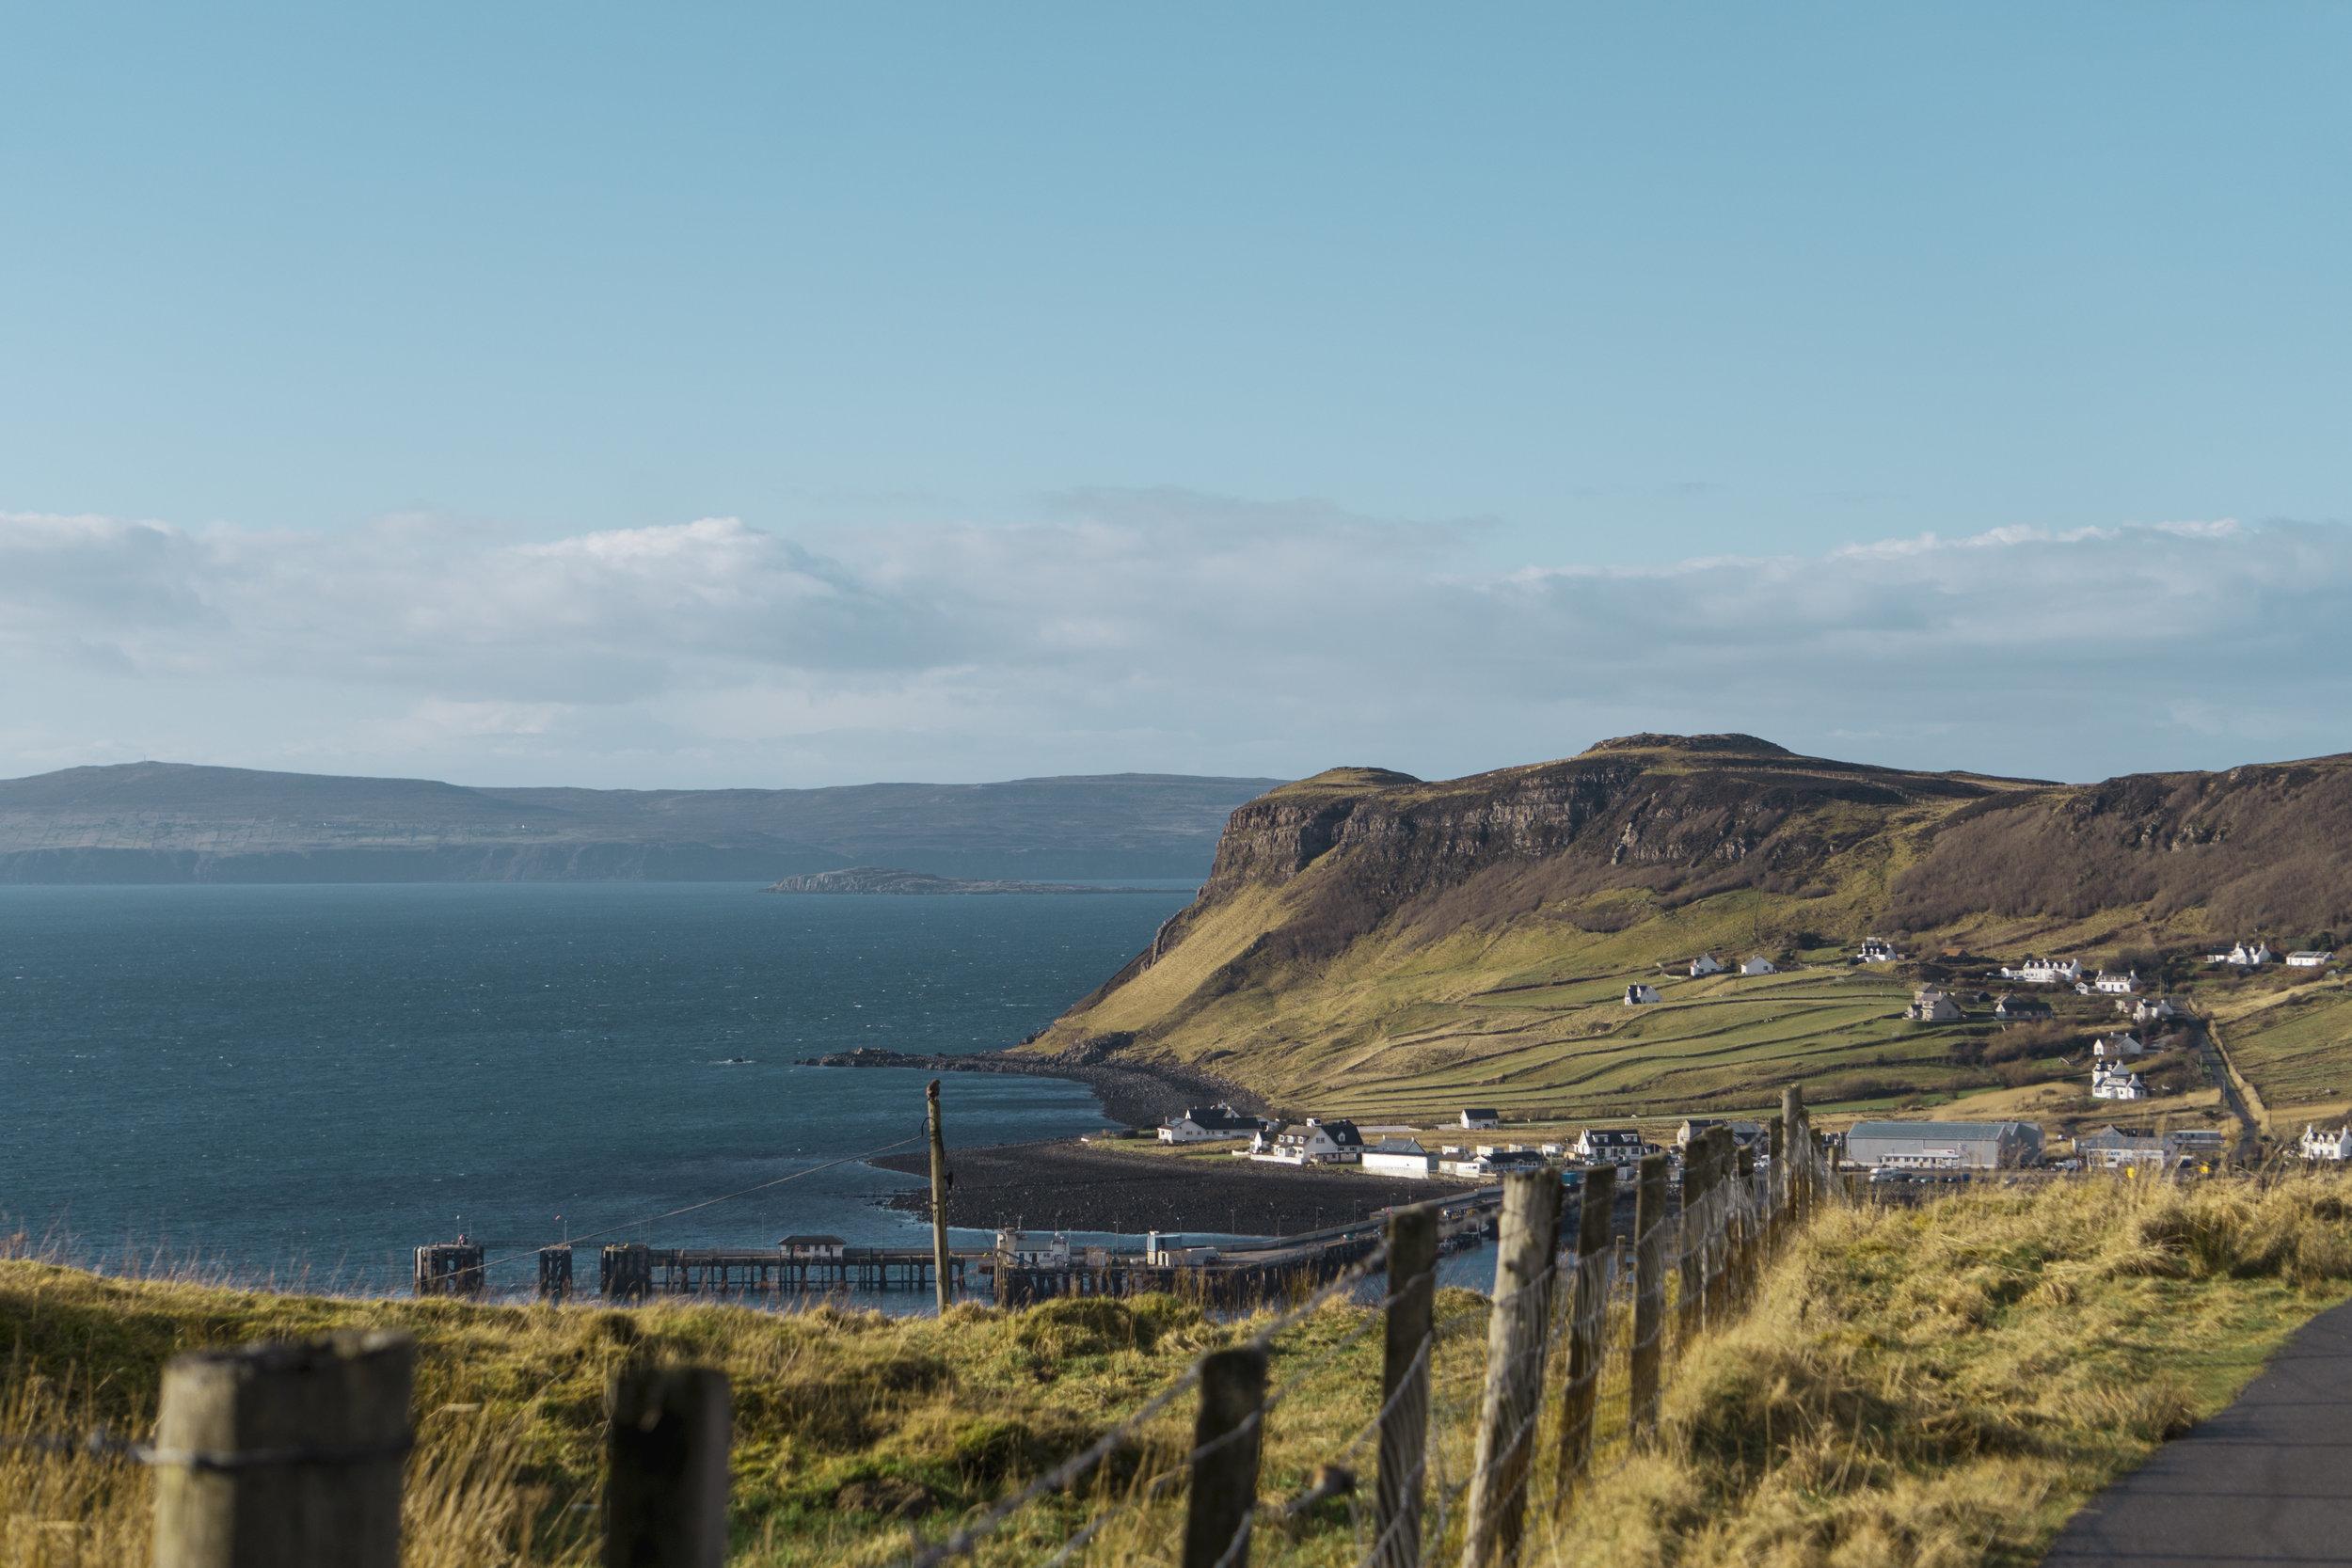 Isle-of-Skye-Fairy-Glen-und-Braes (25).jpg